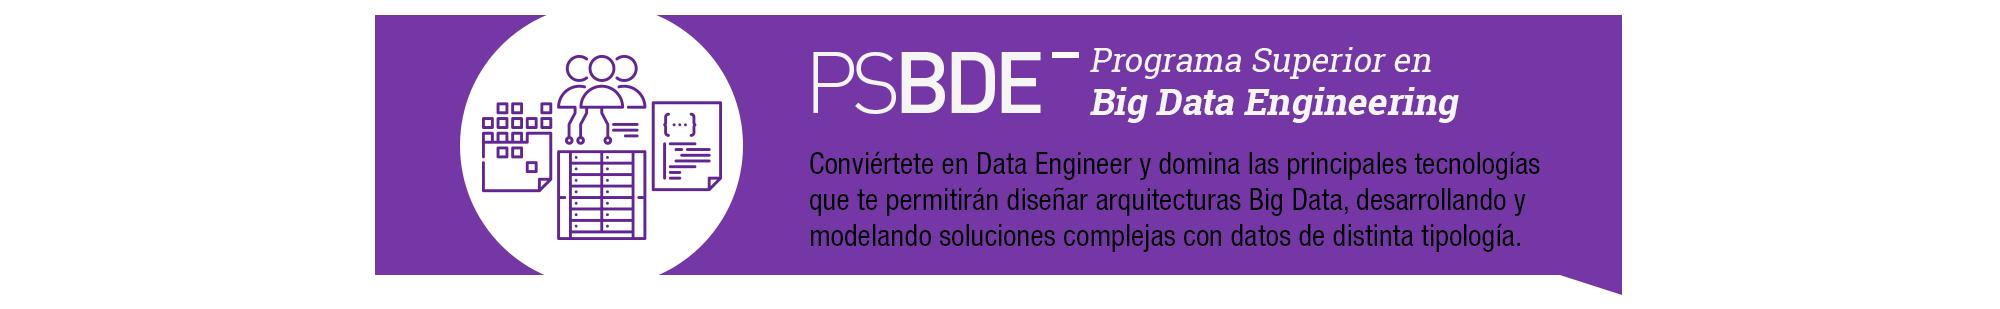 programa_superior_big_data_engineer